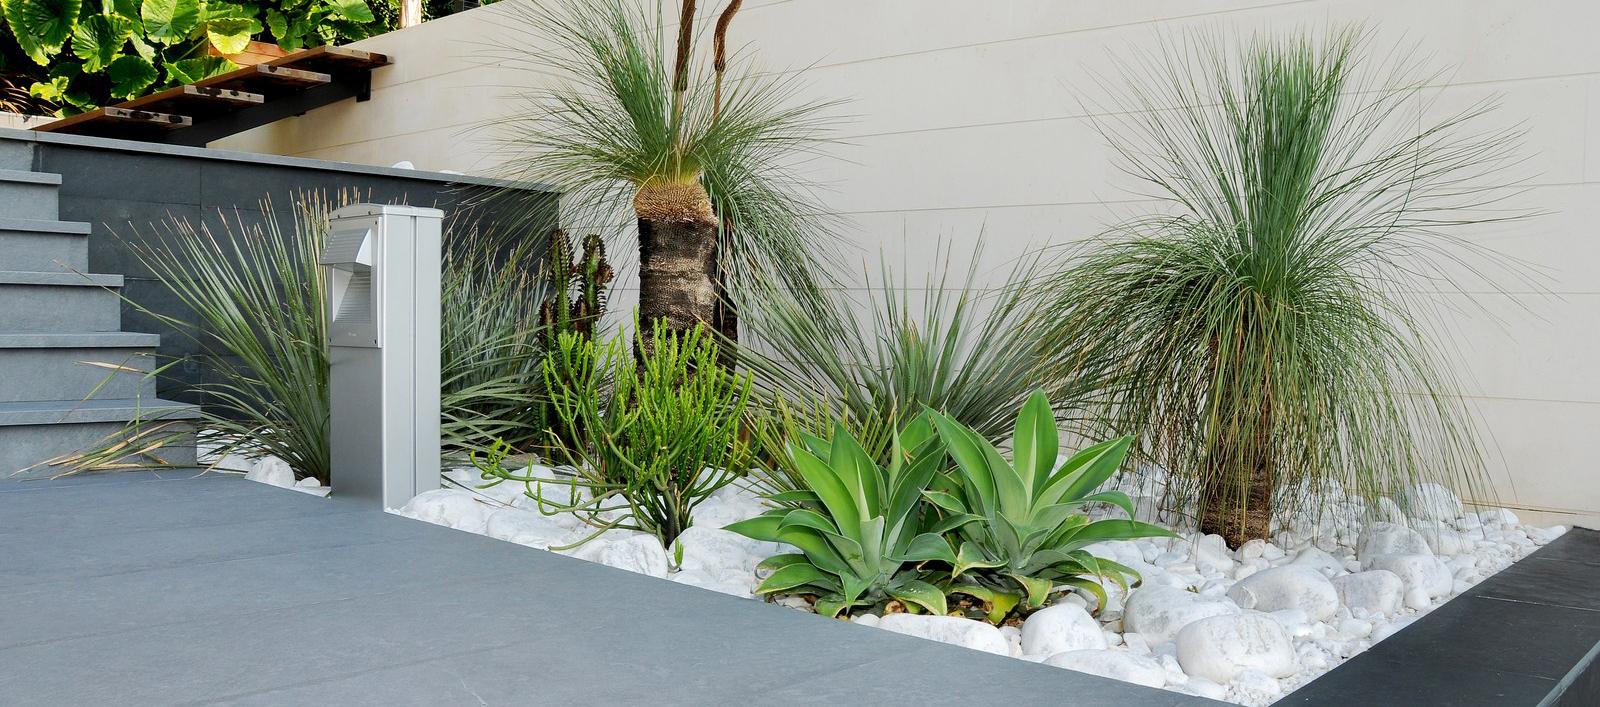 diseño jardines particulares